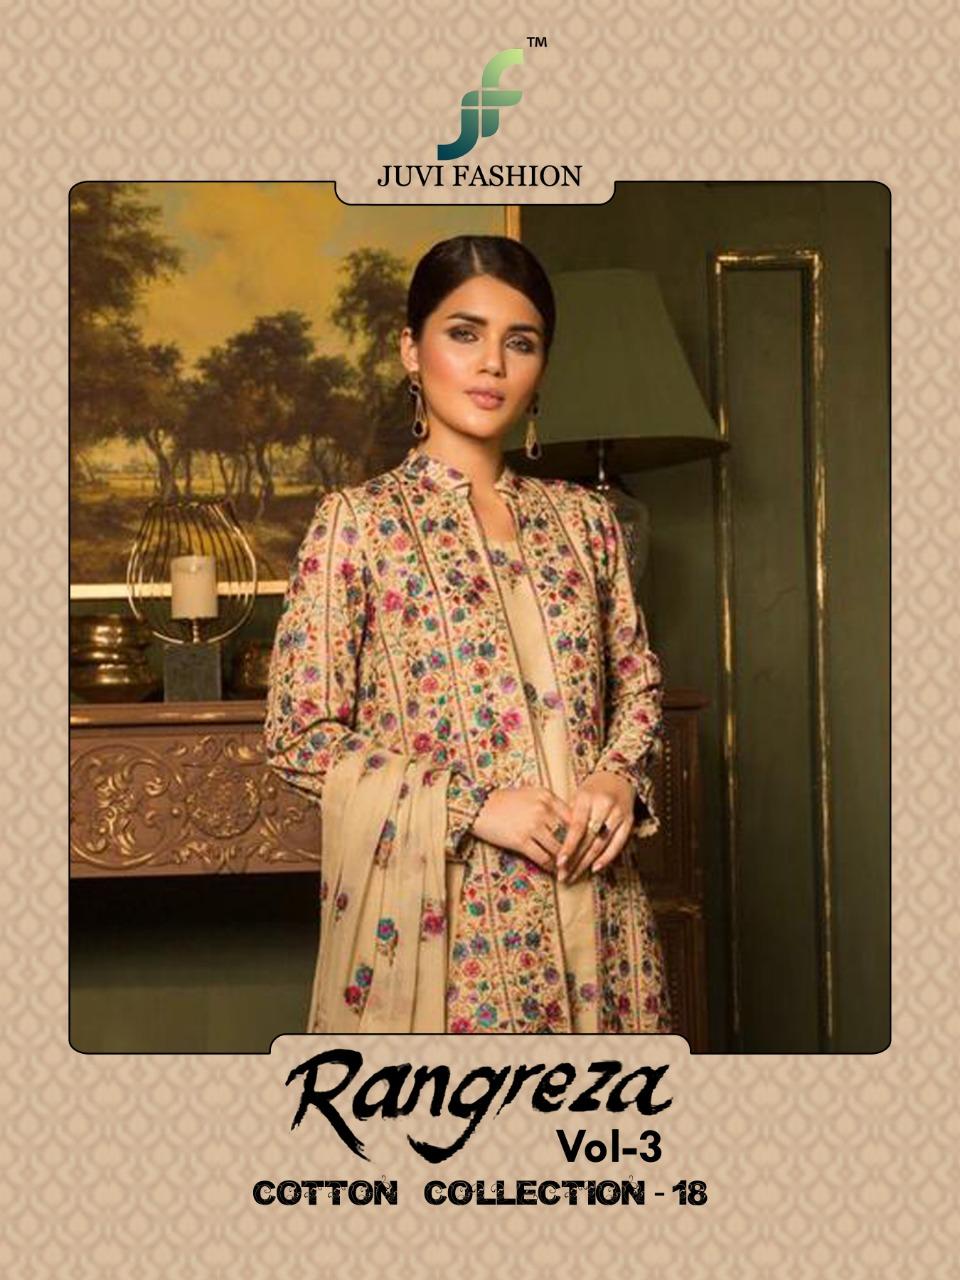 JUVI fashion Launch rangreza vol 3 pakistani concept of salwar kameez